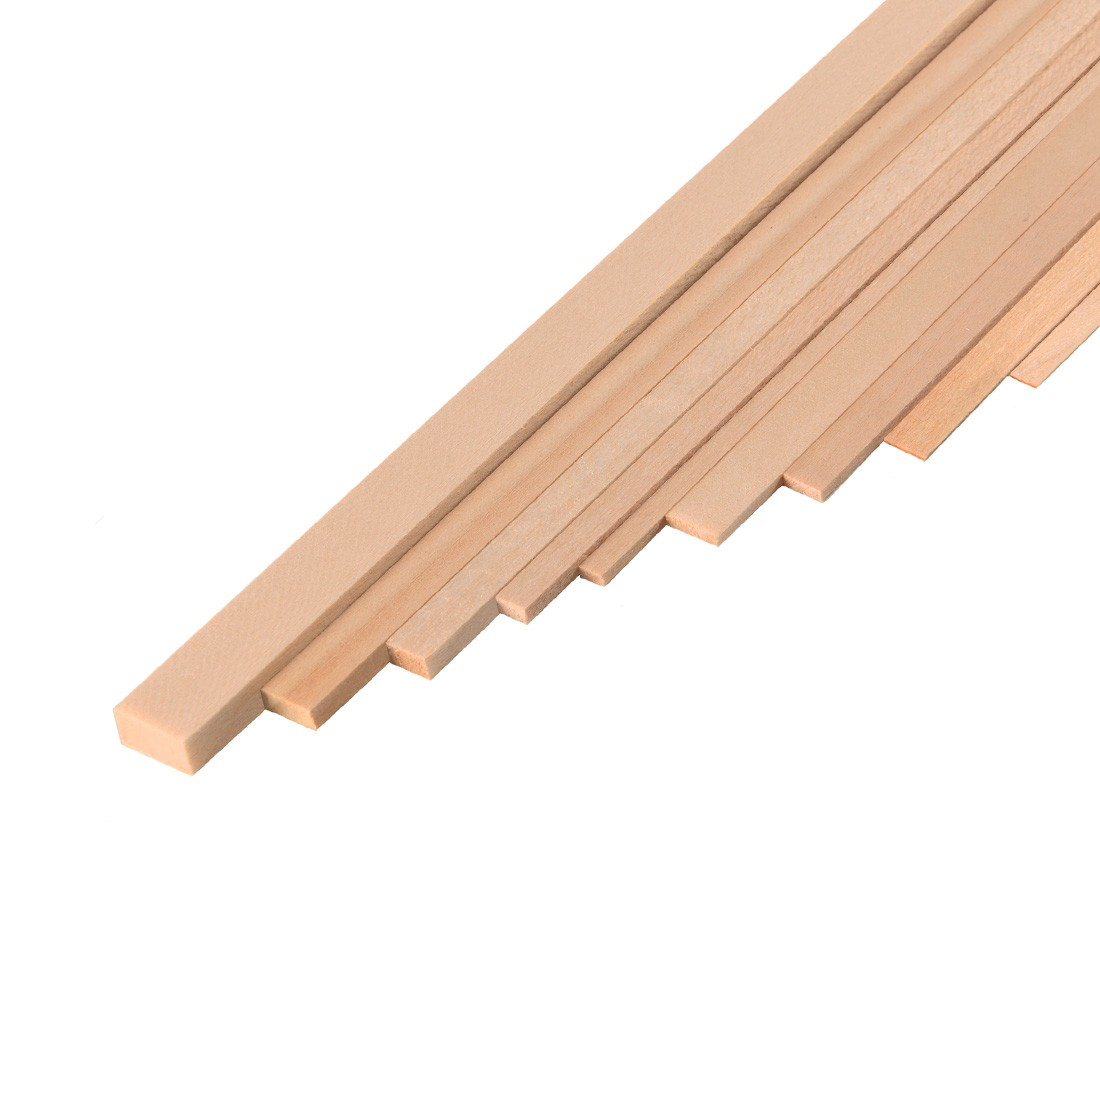 Limewood strip 0,5x3